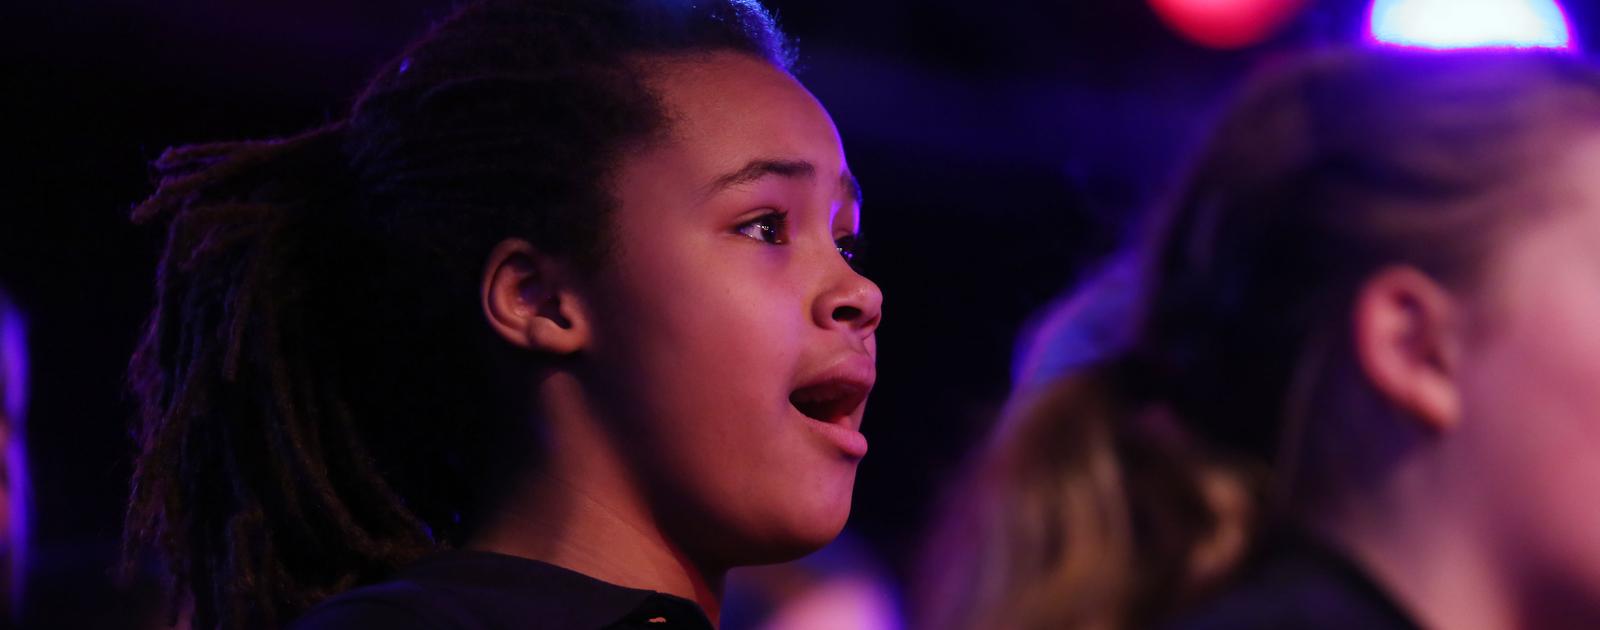 Young Girl Singing in Chorus